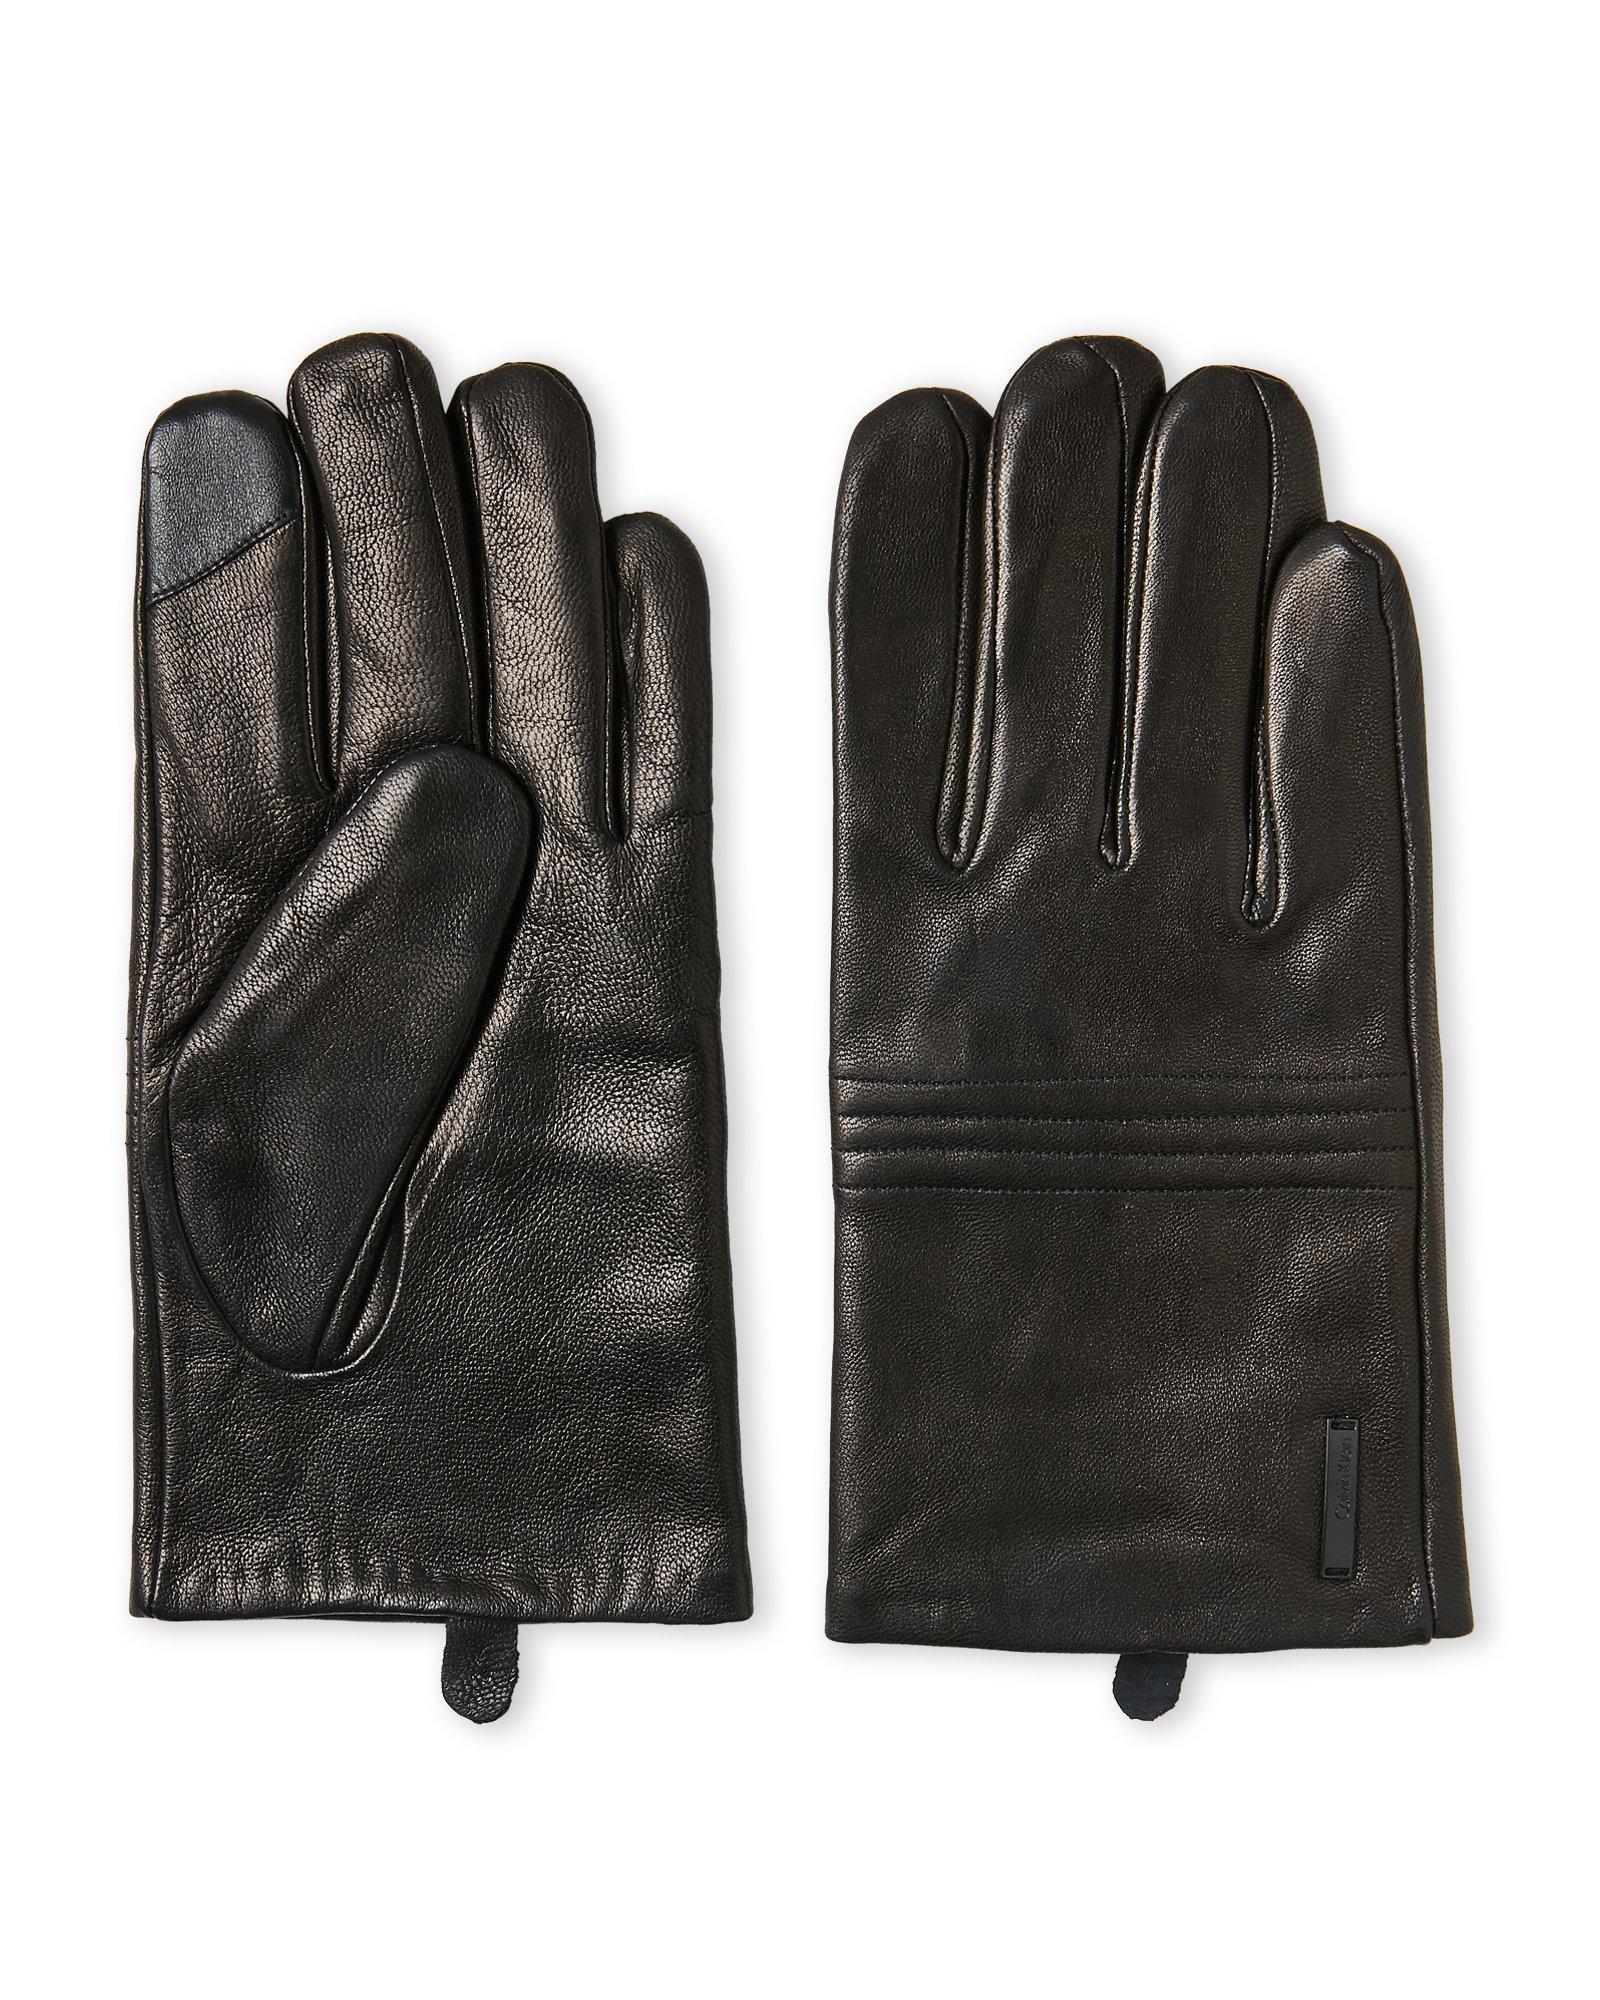 Lyst - Calvin klein Black Quilted Leather Tech Gloves in Black for Men : quilted leather gloves mens - Adamdwight.com